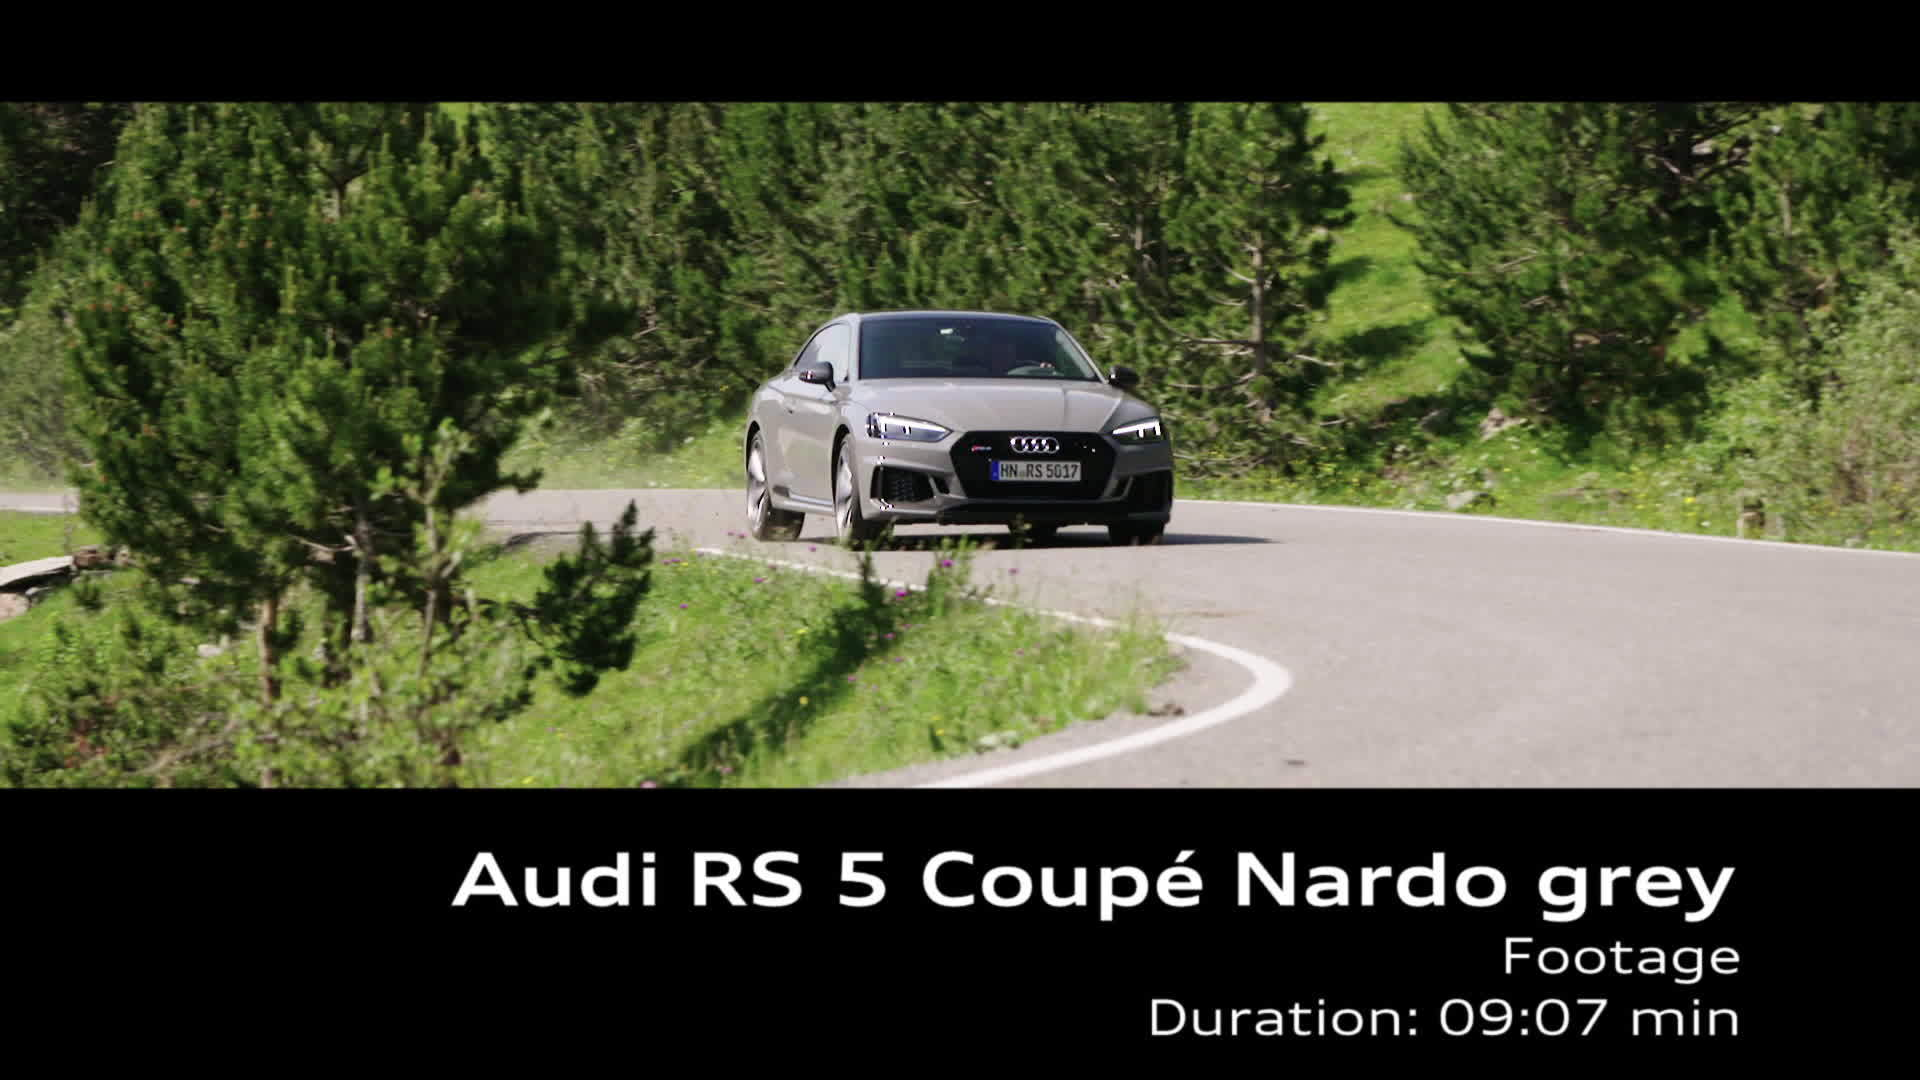 Audi RS 5 Coupé Nardo grey - Footage on Location Andorra